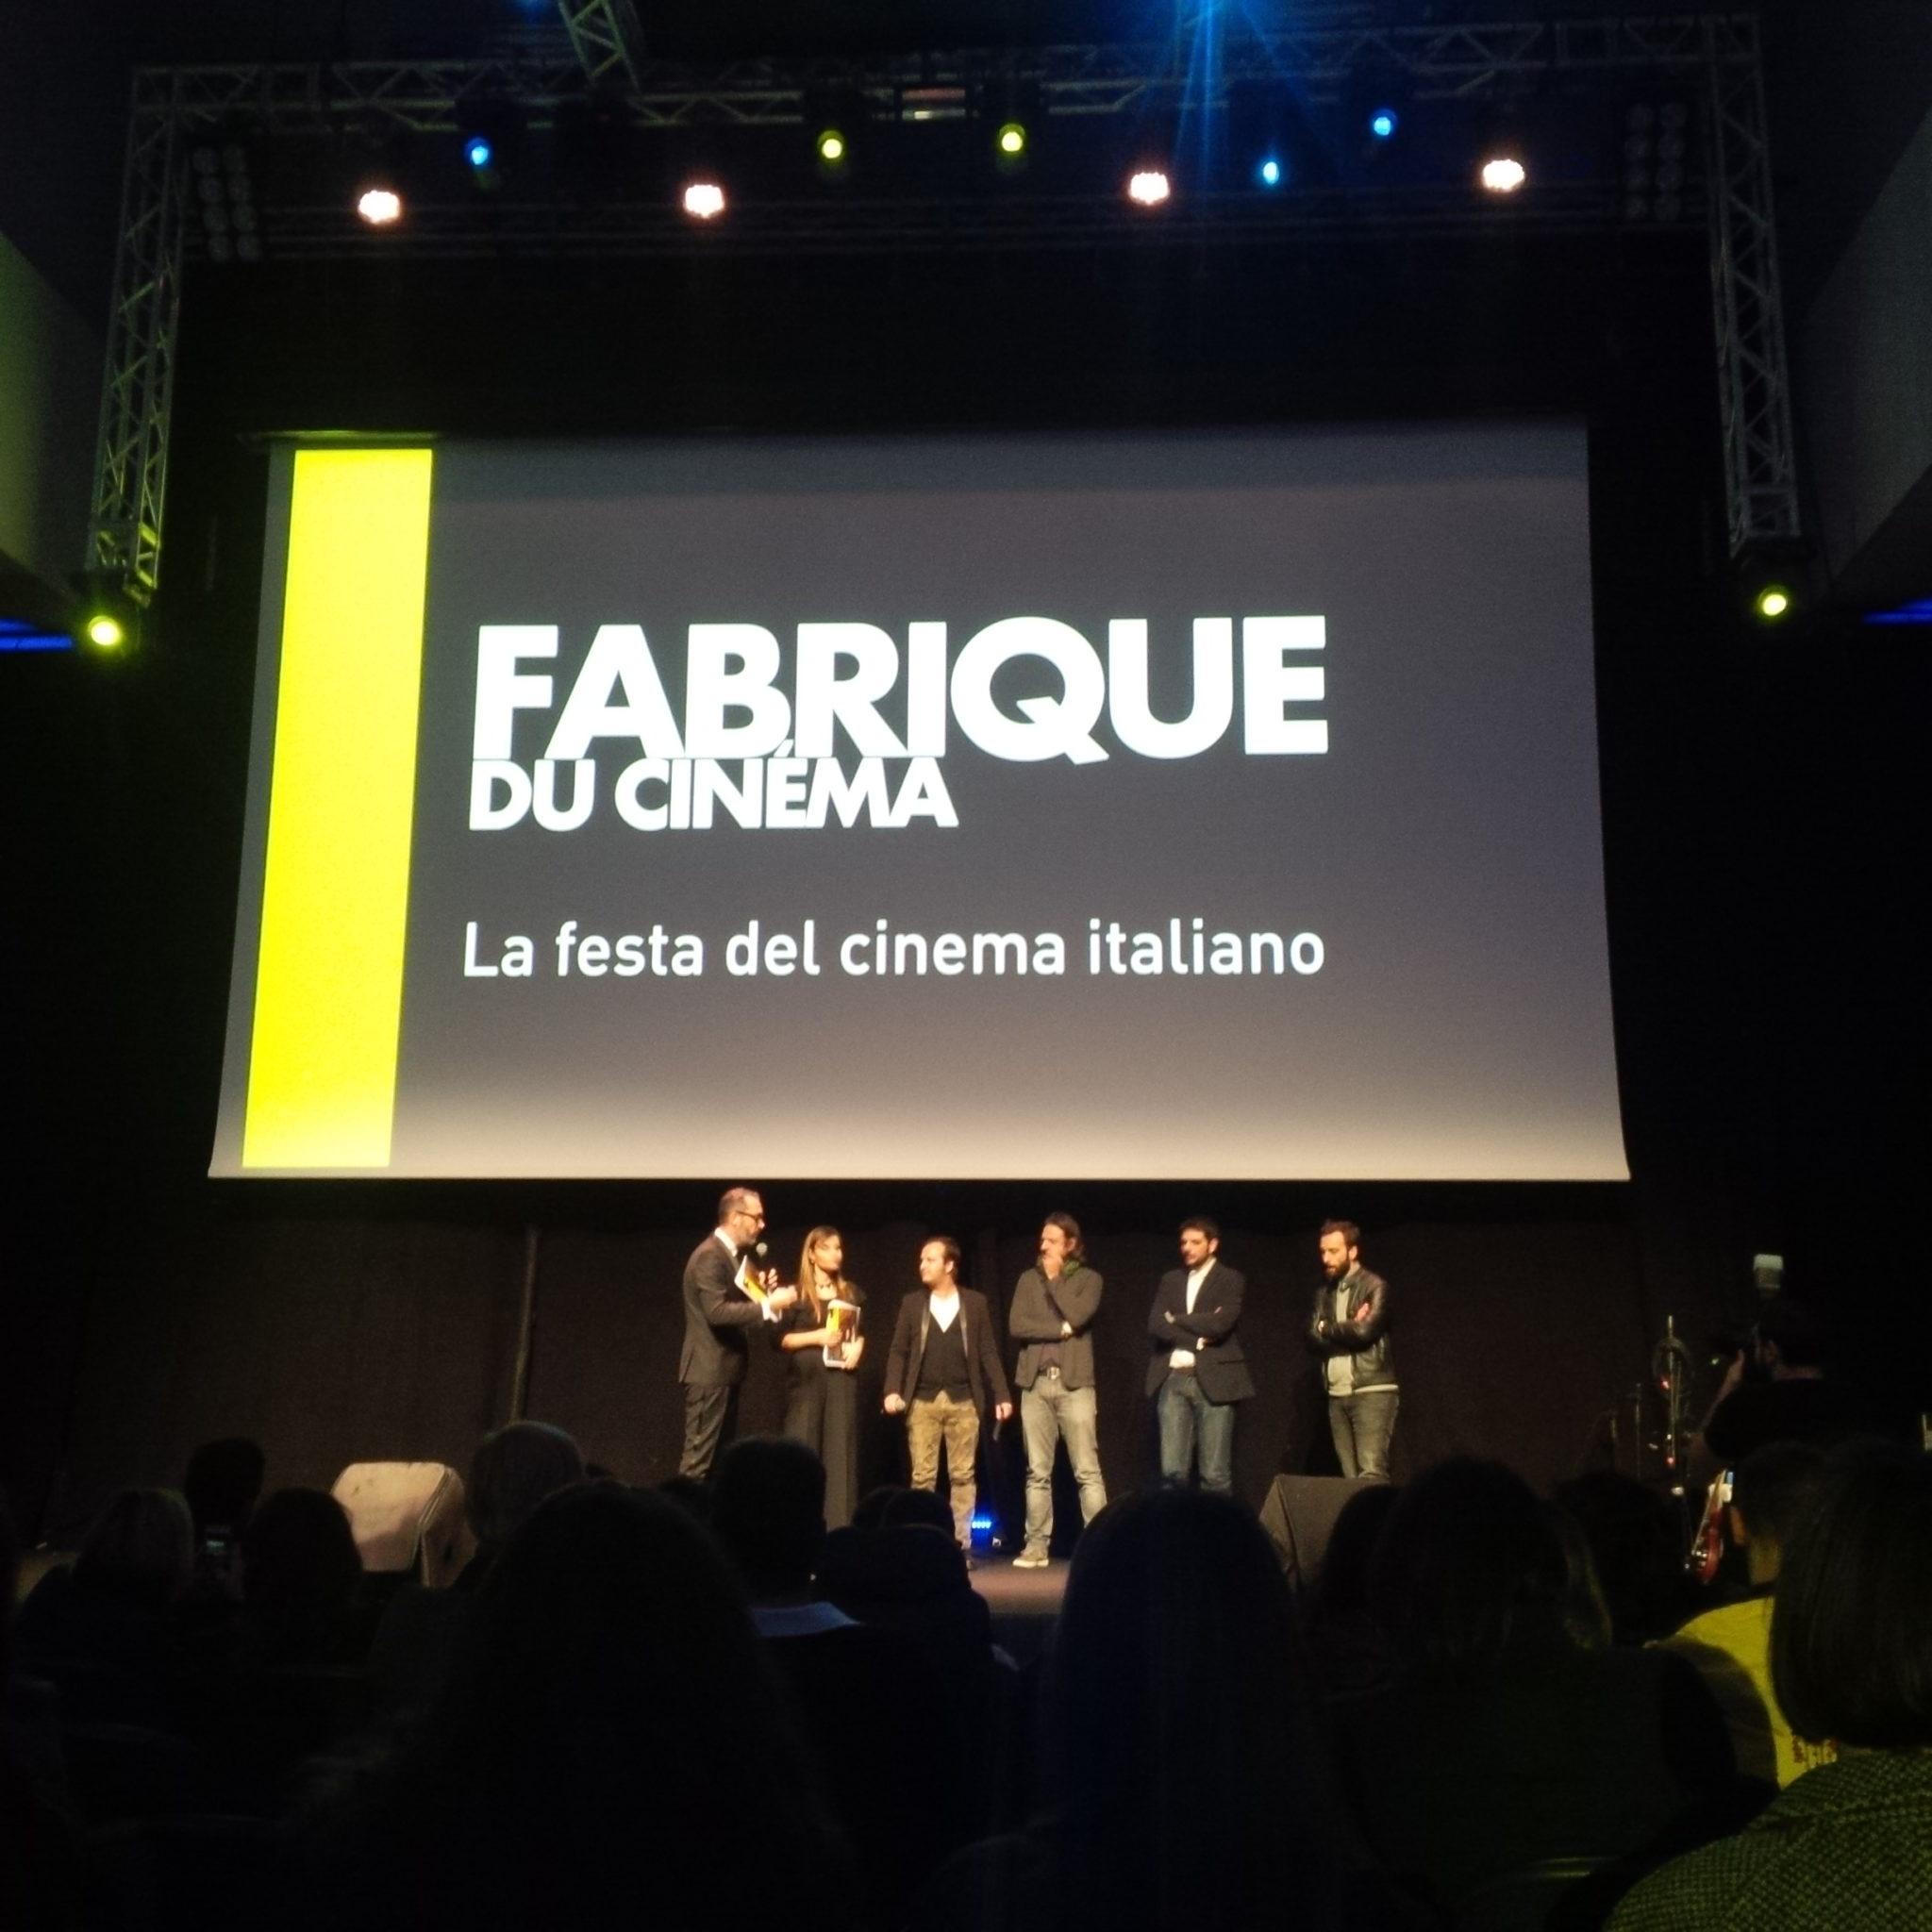 FABRIQUE DU CINÉMA – Seconda edizione